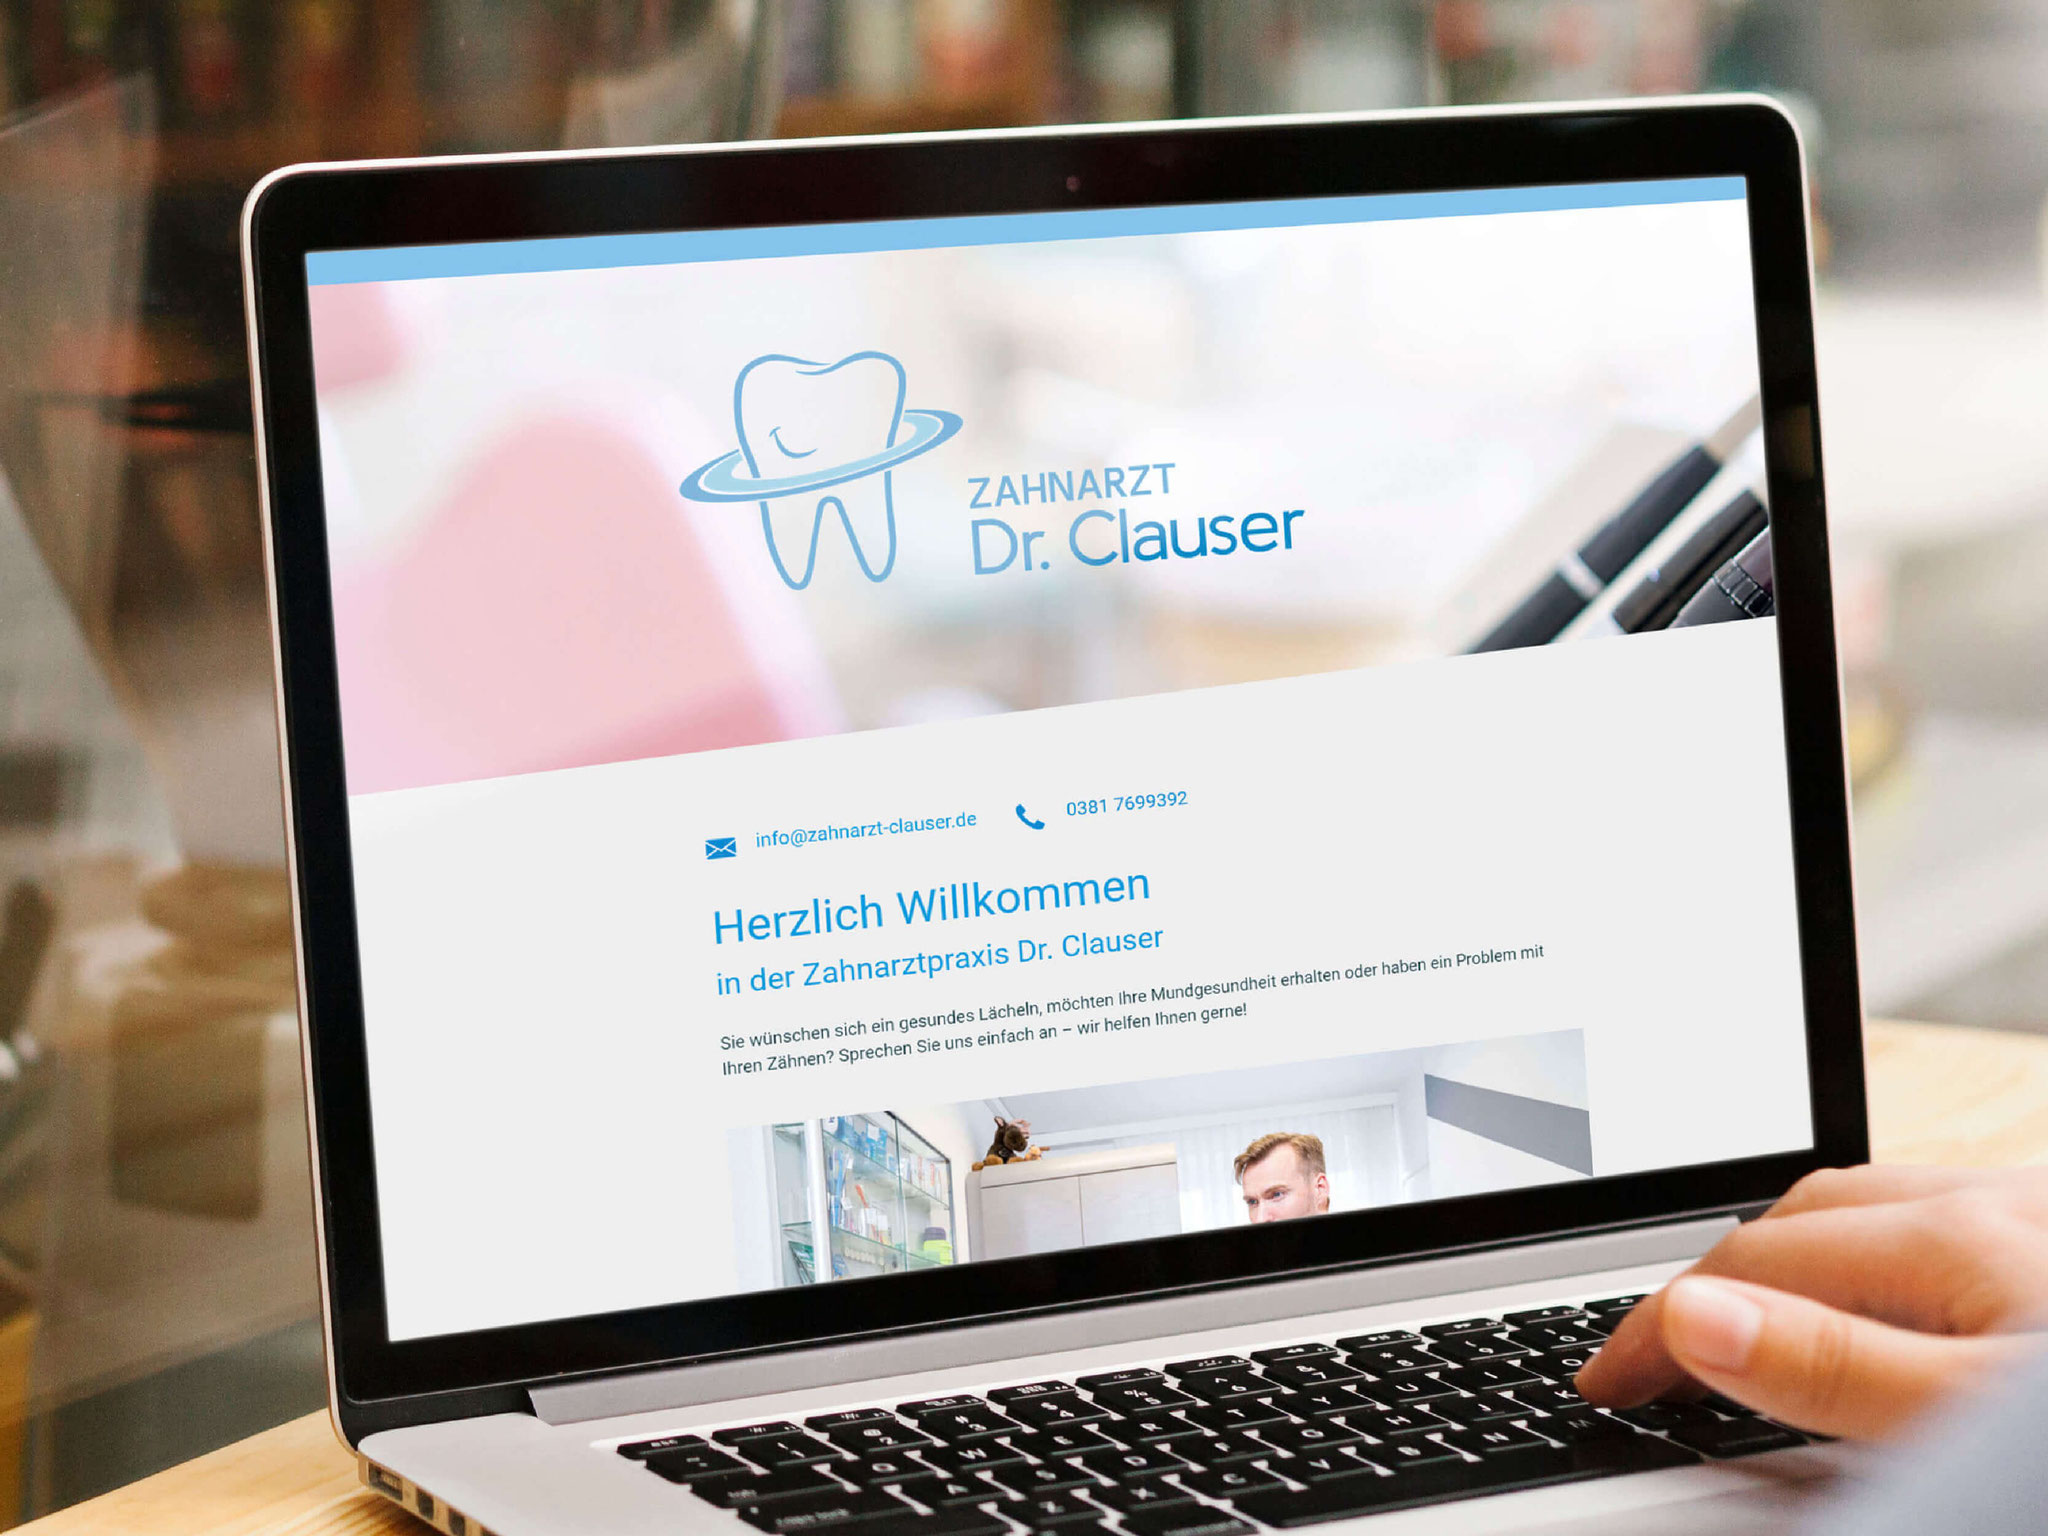 Zahnarzt Dr. Clauser - Webseite & SEO